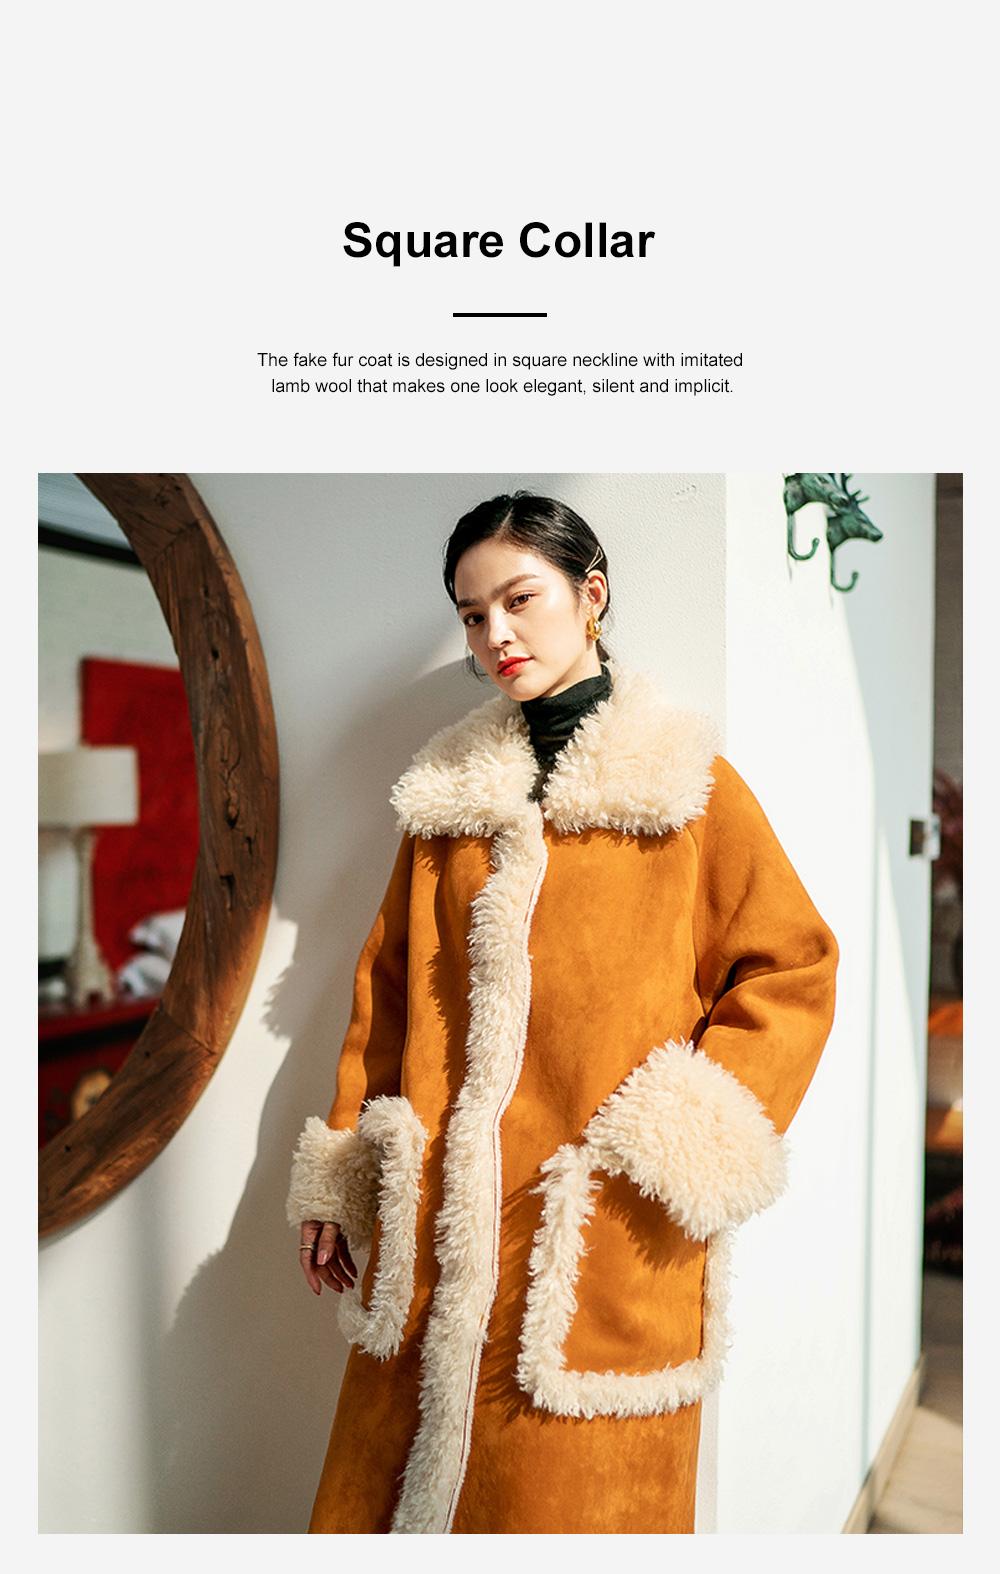 Fake Fur Long Coat for Women Wear Imitated Lamb Wool Great Coat Autumn Winter 2019 5